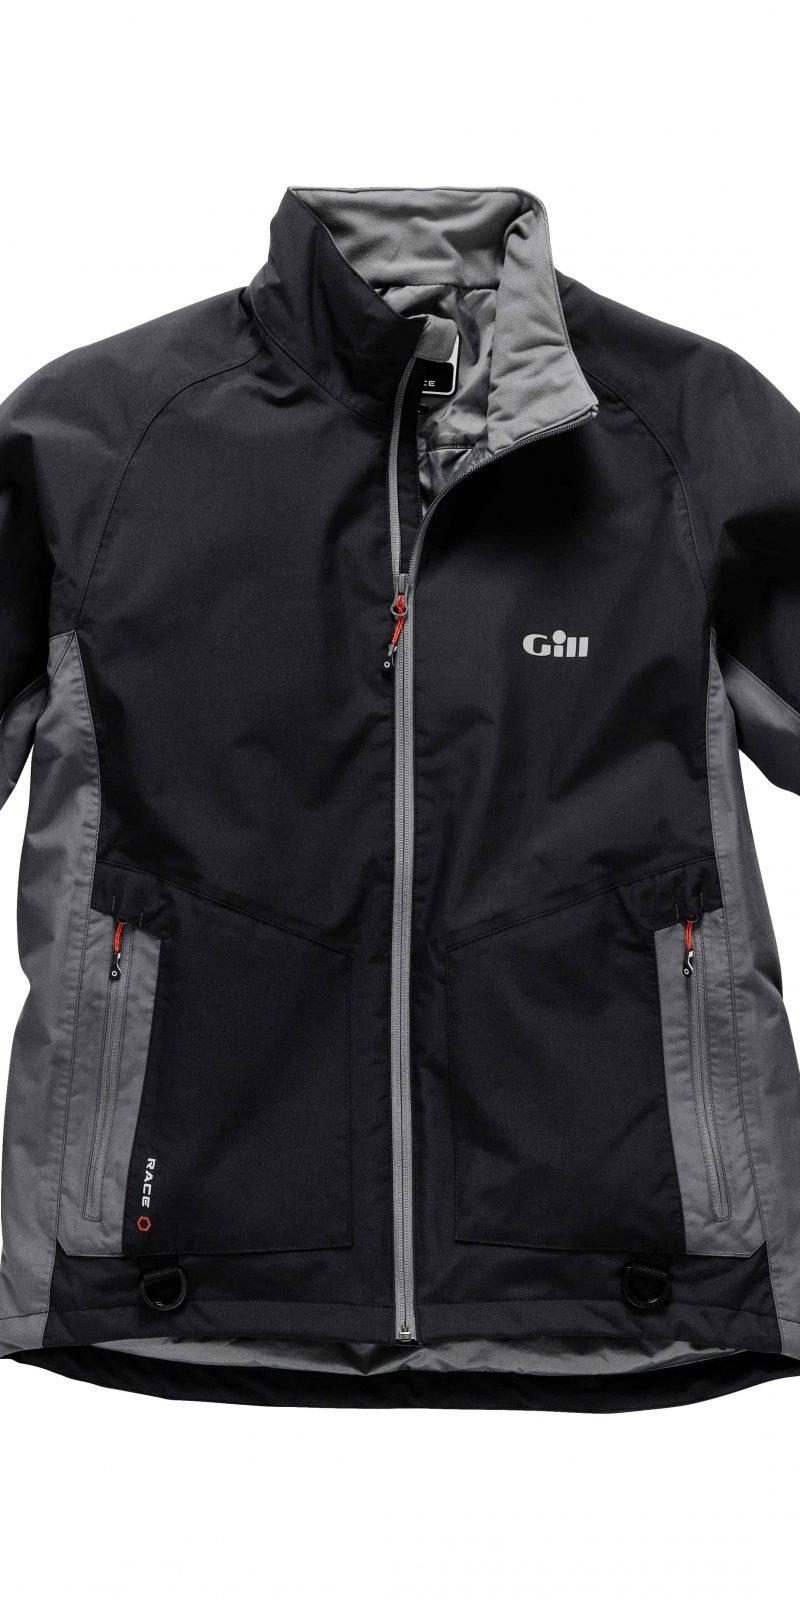 Gill – Race Shore Jacket